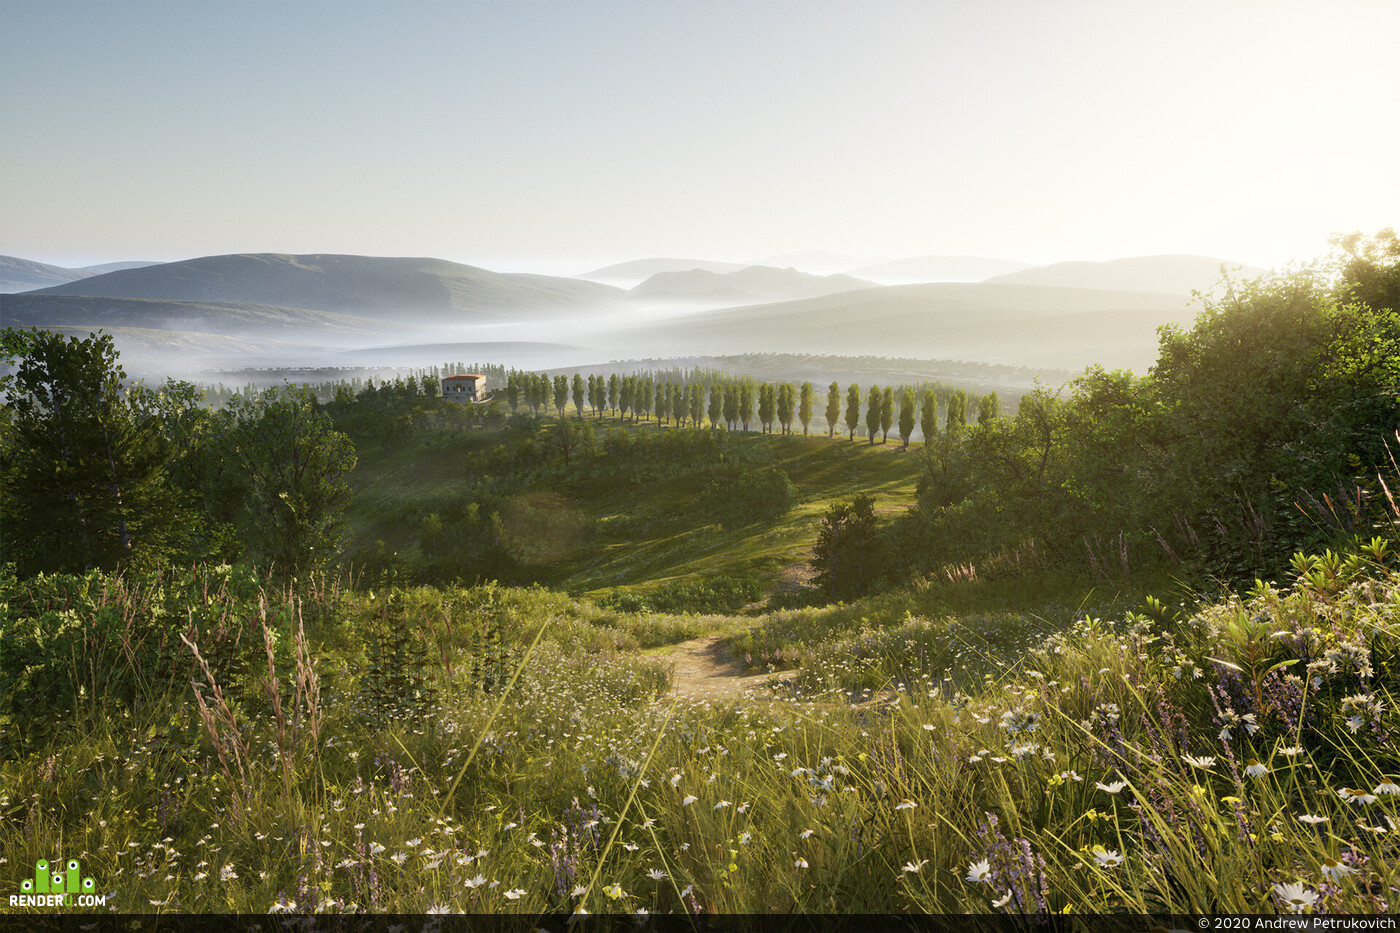 Unreal Engine, Real-time rendering, фотореализм, сканирование, мегасканы, quixel megascans